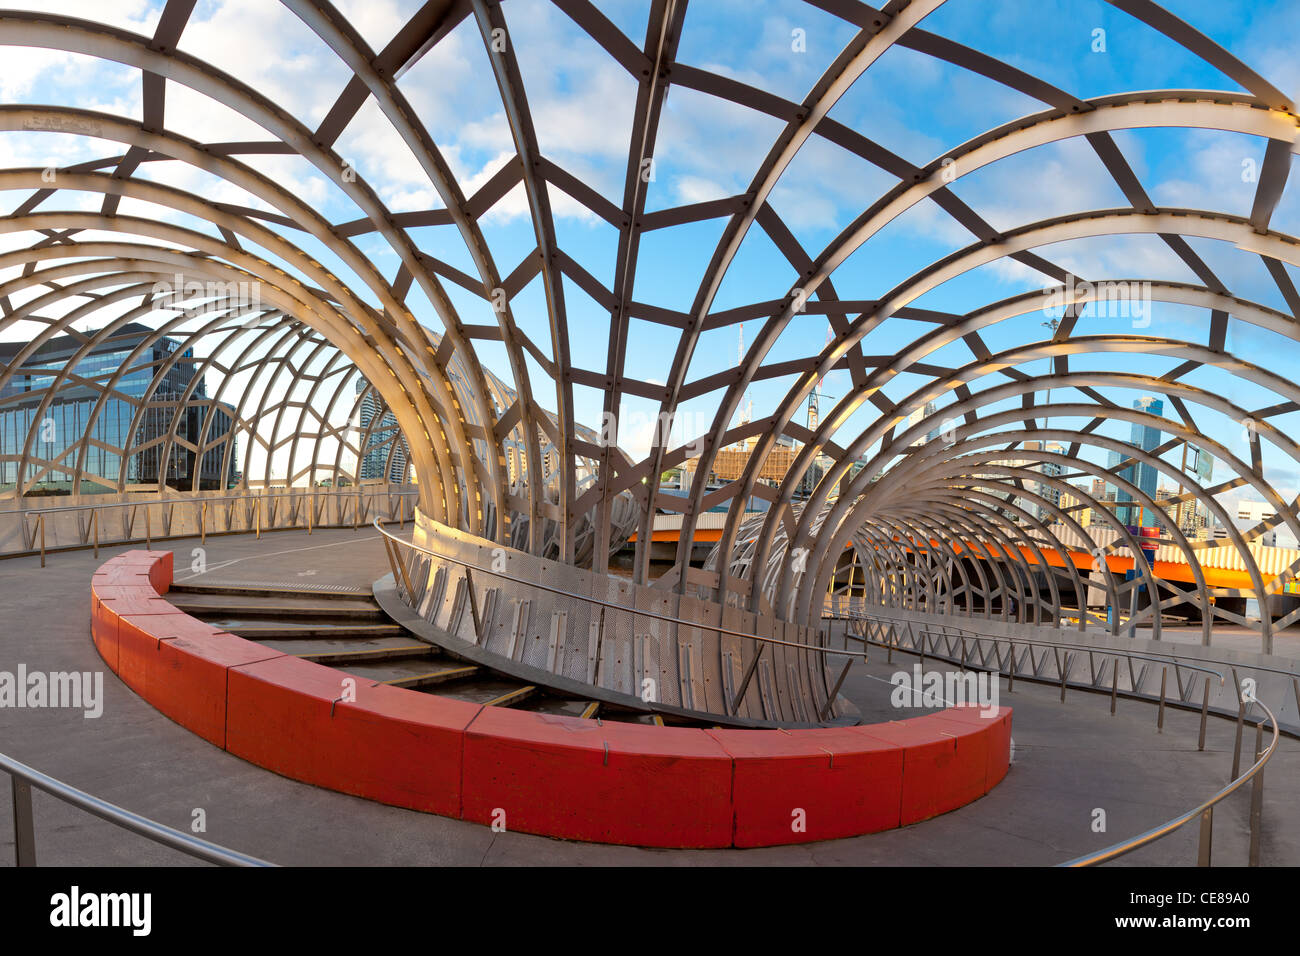 Webb Bridge in Melbourne Docklands - Stock Image